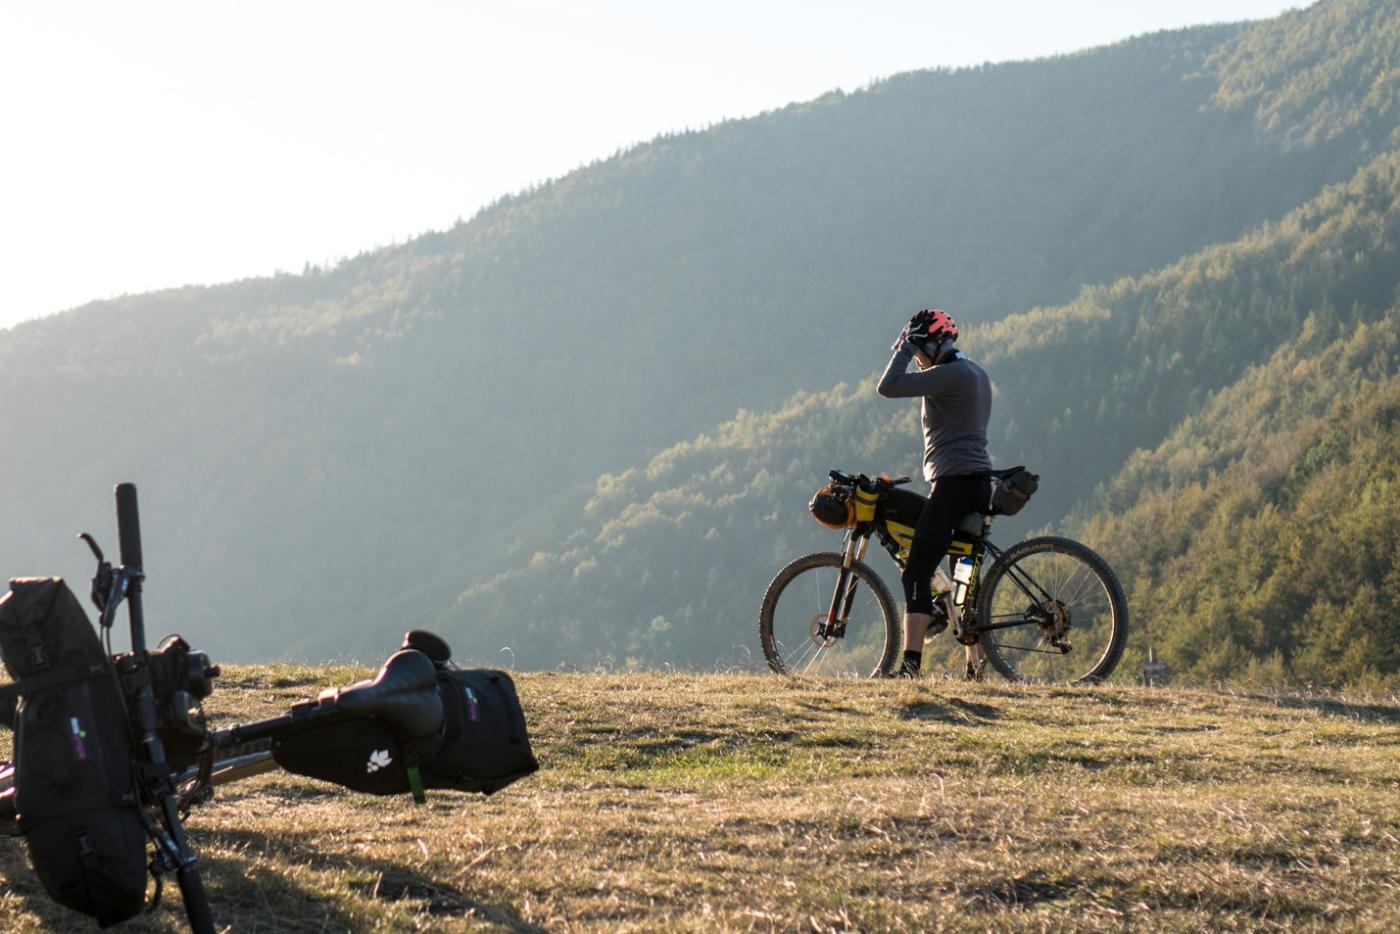 pratomagno_bikepacking-18